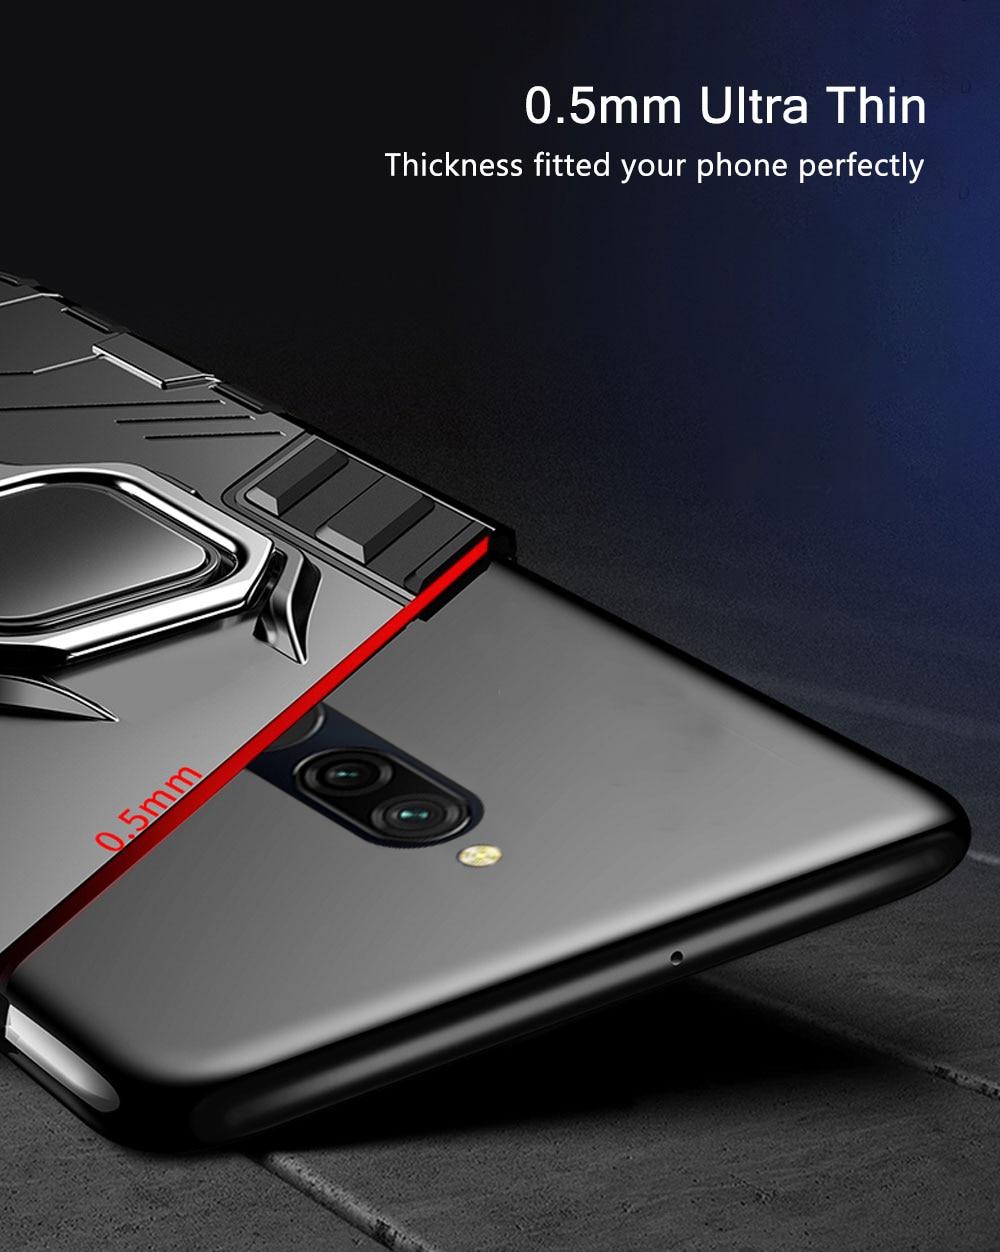 Hb6dae20b202d40ae8f19041091e85d5cZ Armor Case for Redmi 8 8A Case Magnetic Car Phone Holder TPU+PC Bumper Cover on for Xiaomi Redmi 8 8A 8 A Global Version Case